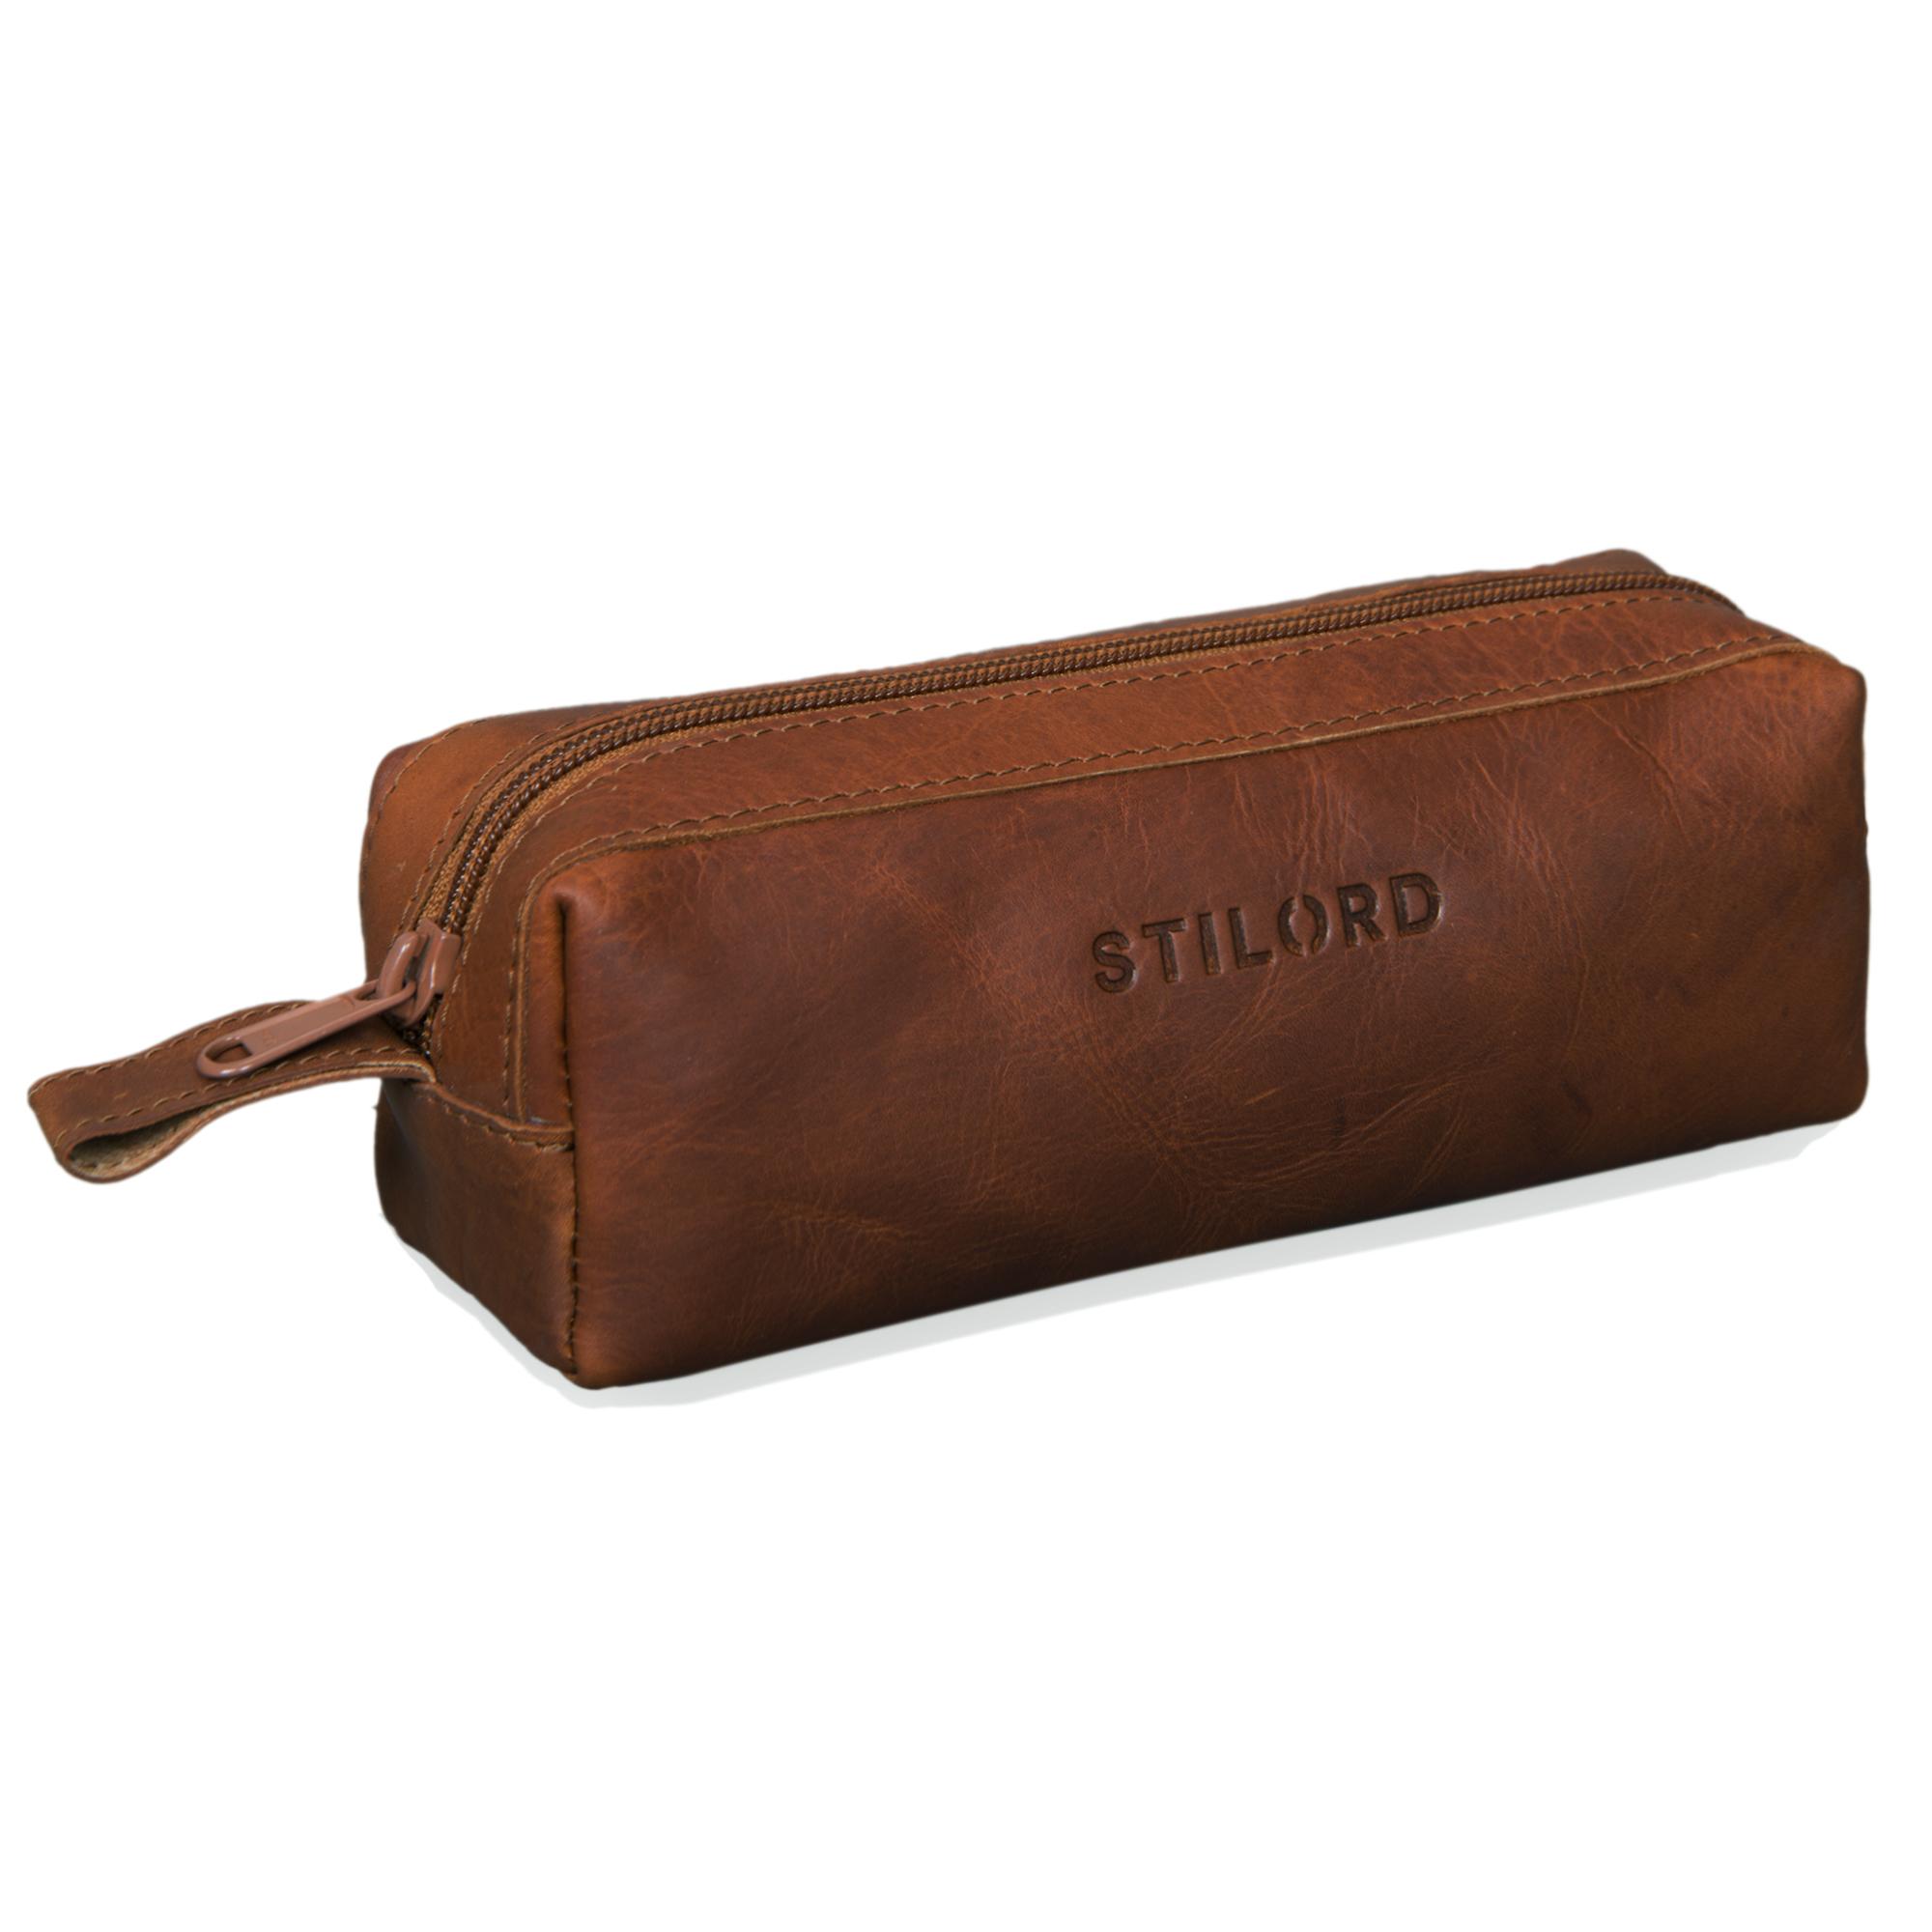 "STILORD ""Linus"" Etui Leder Vintage Herren Damen Stifteetui Lederetui Federmappe quadratisch Stiftetasche - Bild 5"